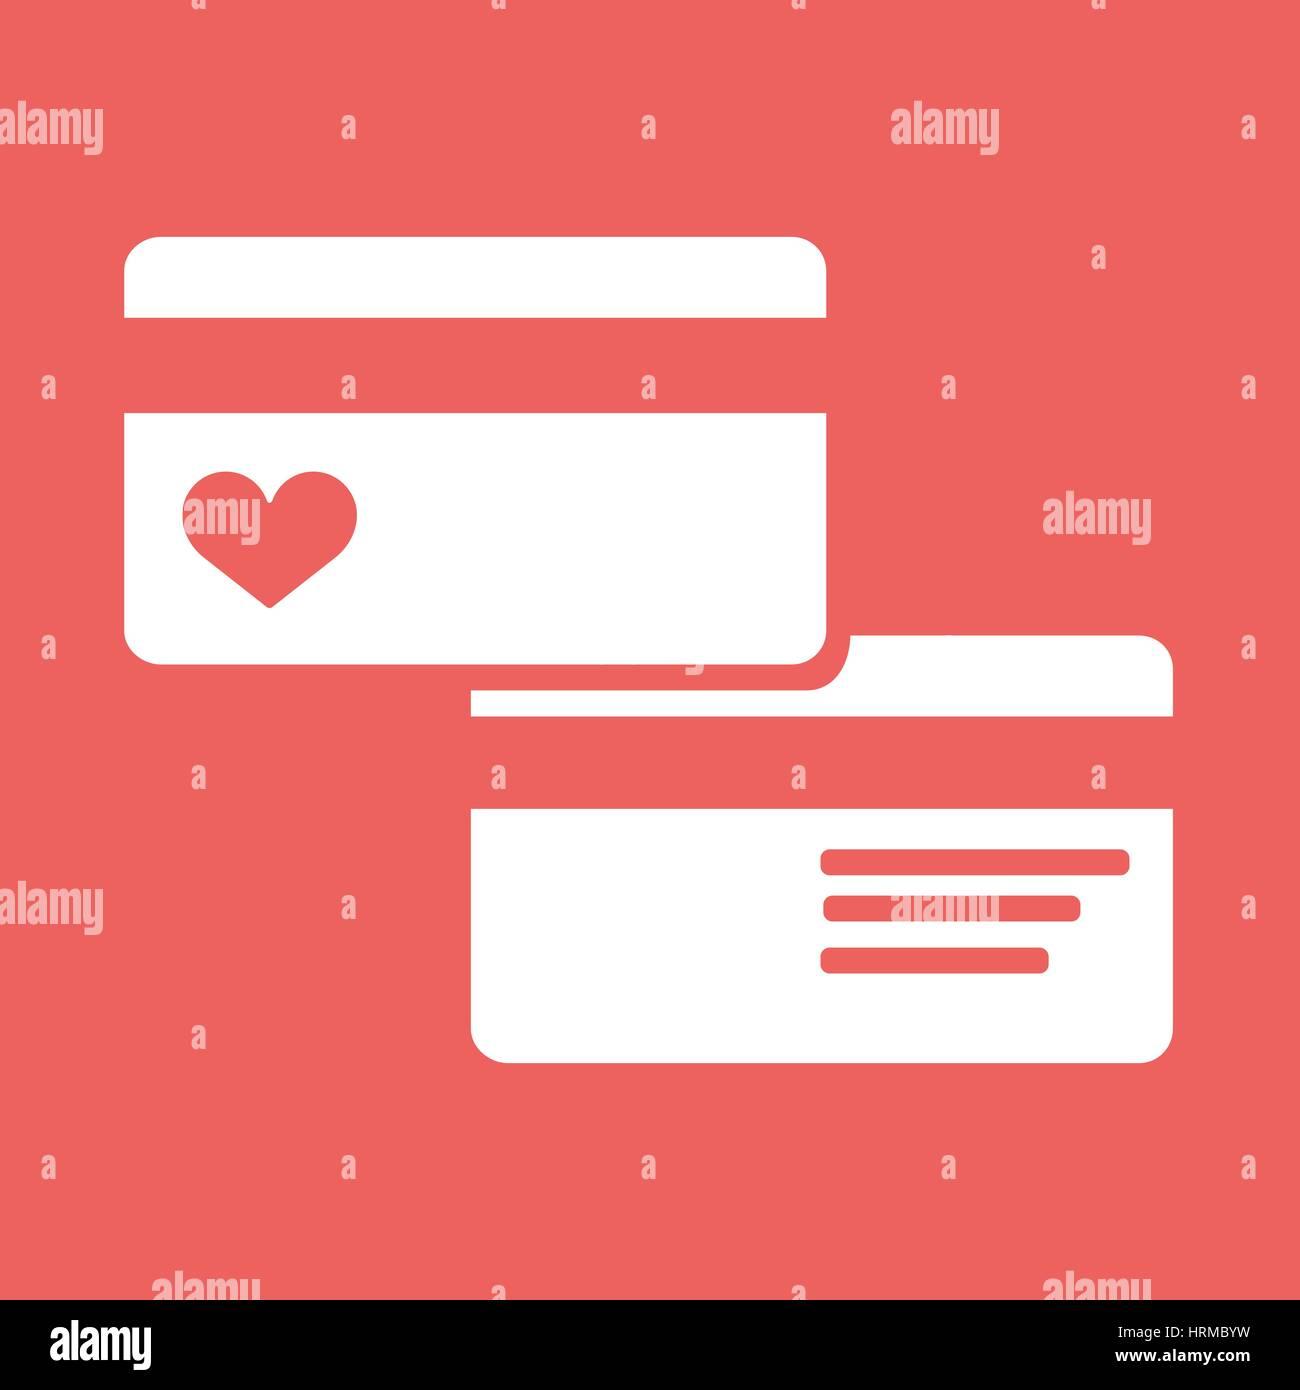 Kreditkarte-Piktogramm-flach-Symbol Vektor Abbildung - Bild ...